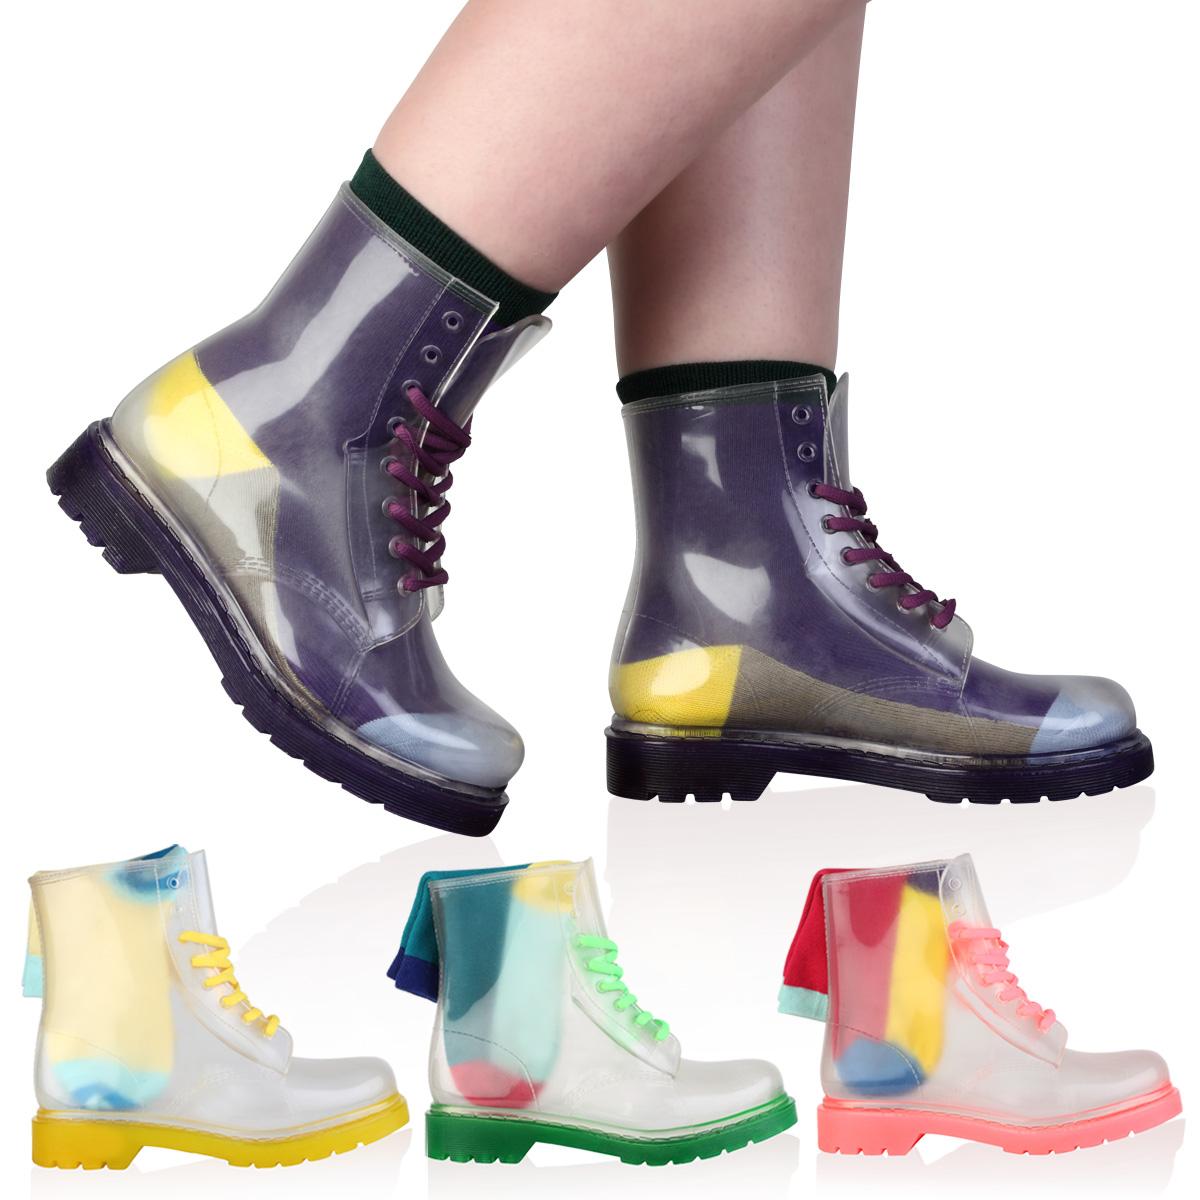 Clear Rubber Rain Boots - Yu Boots